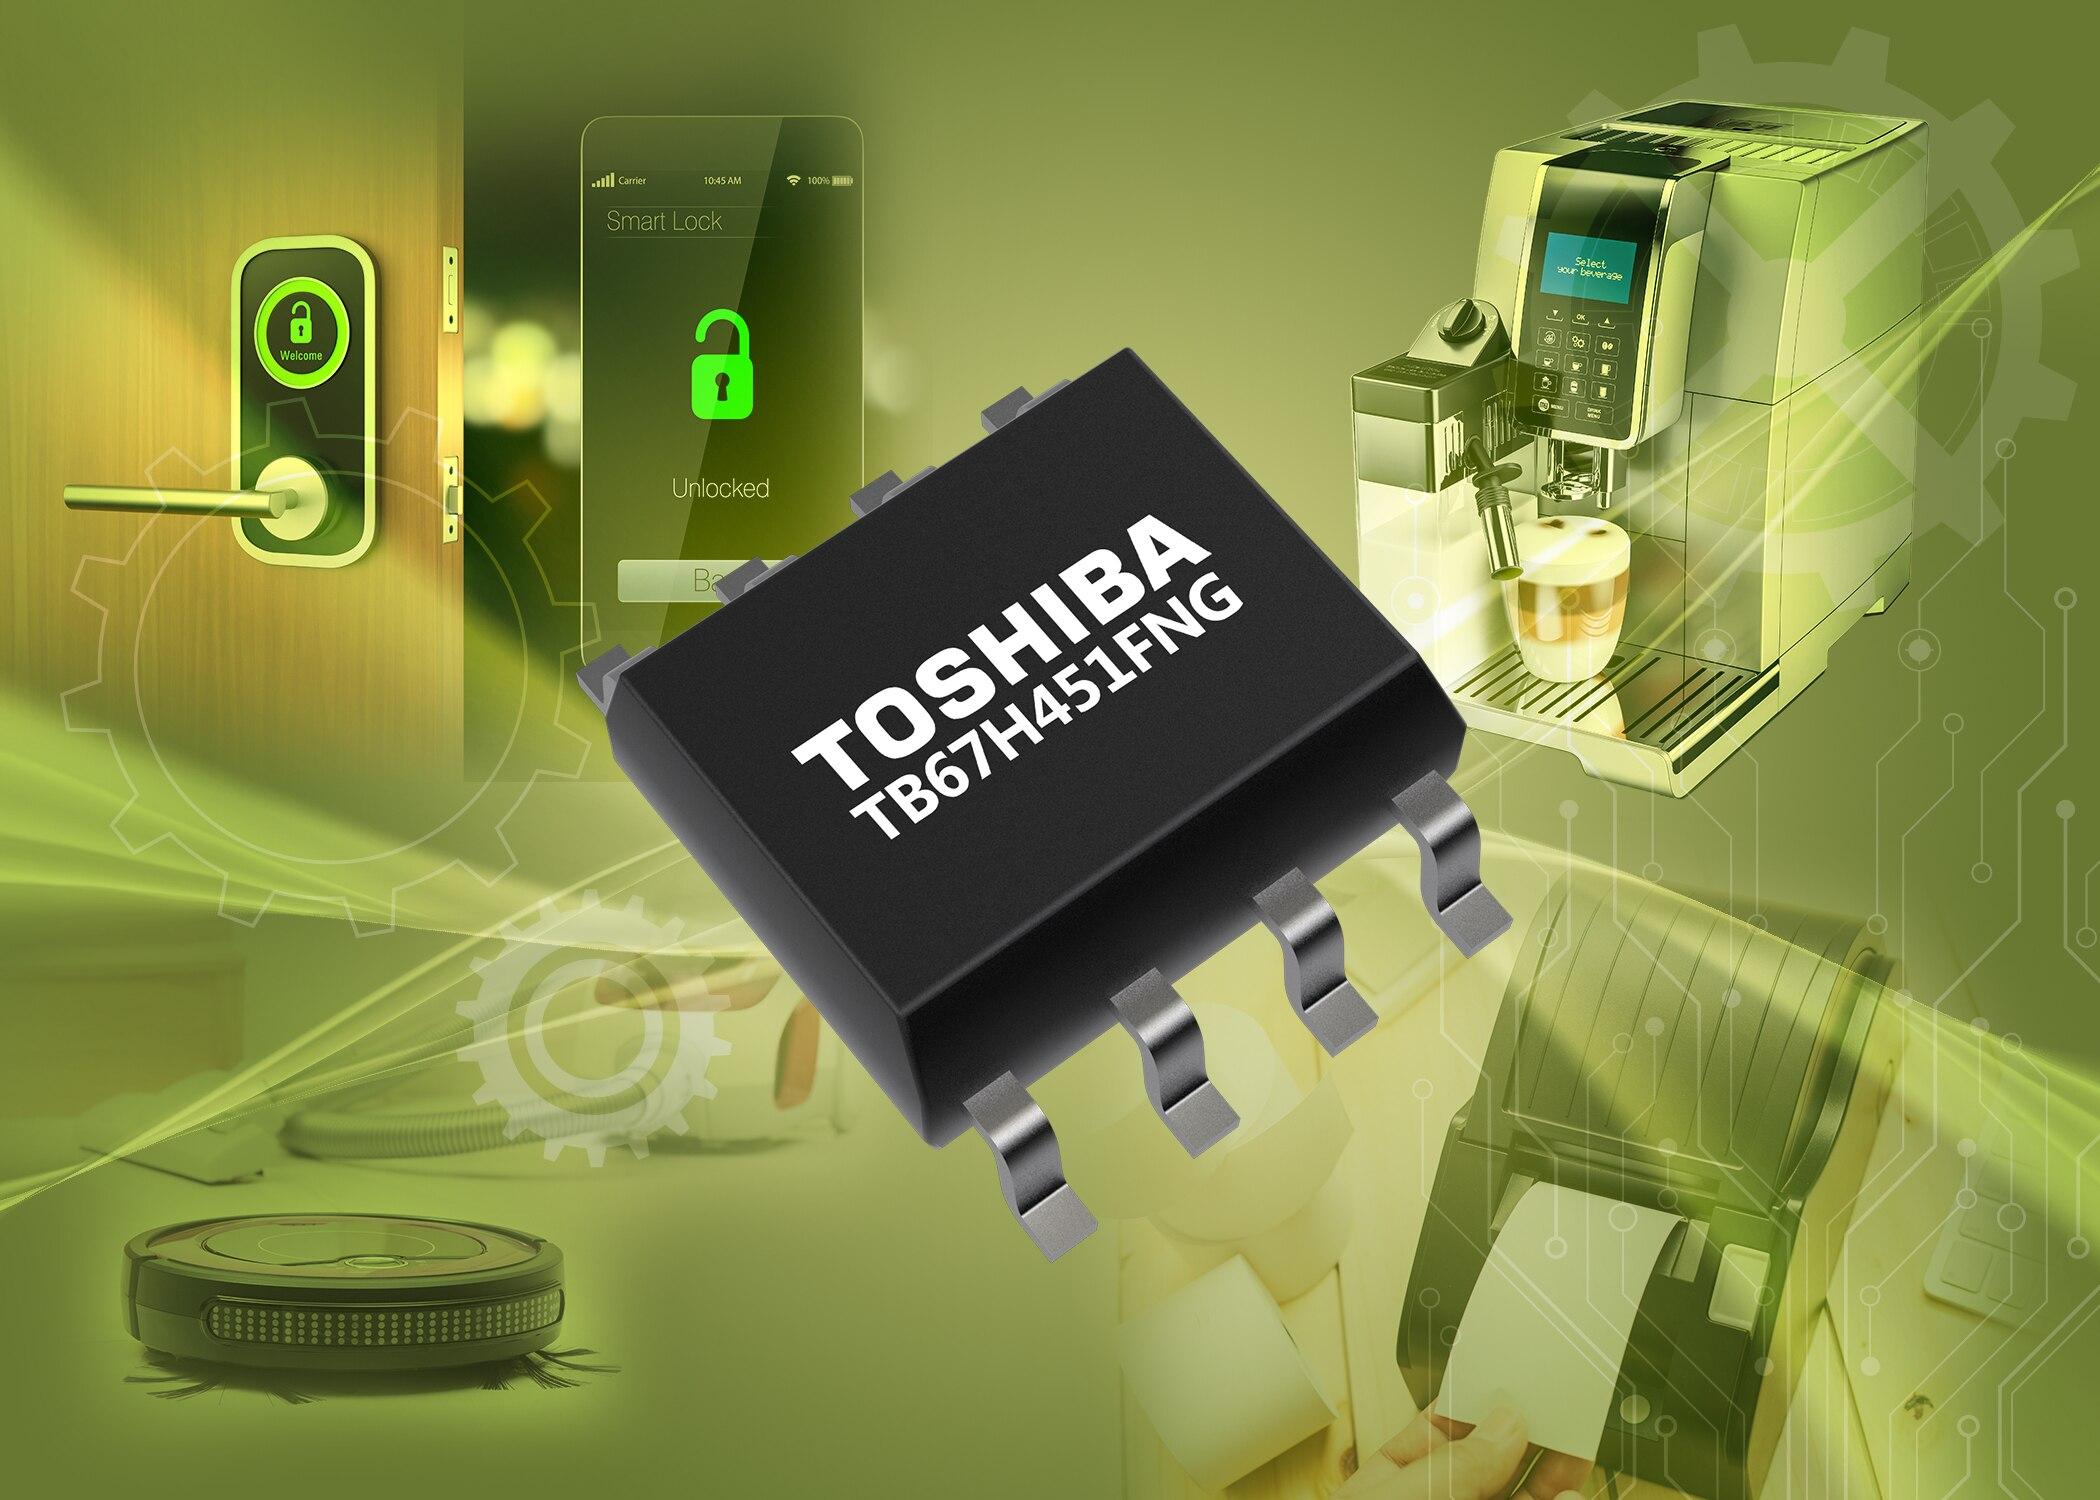 Toshiba_TB67H451FNG.jpg